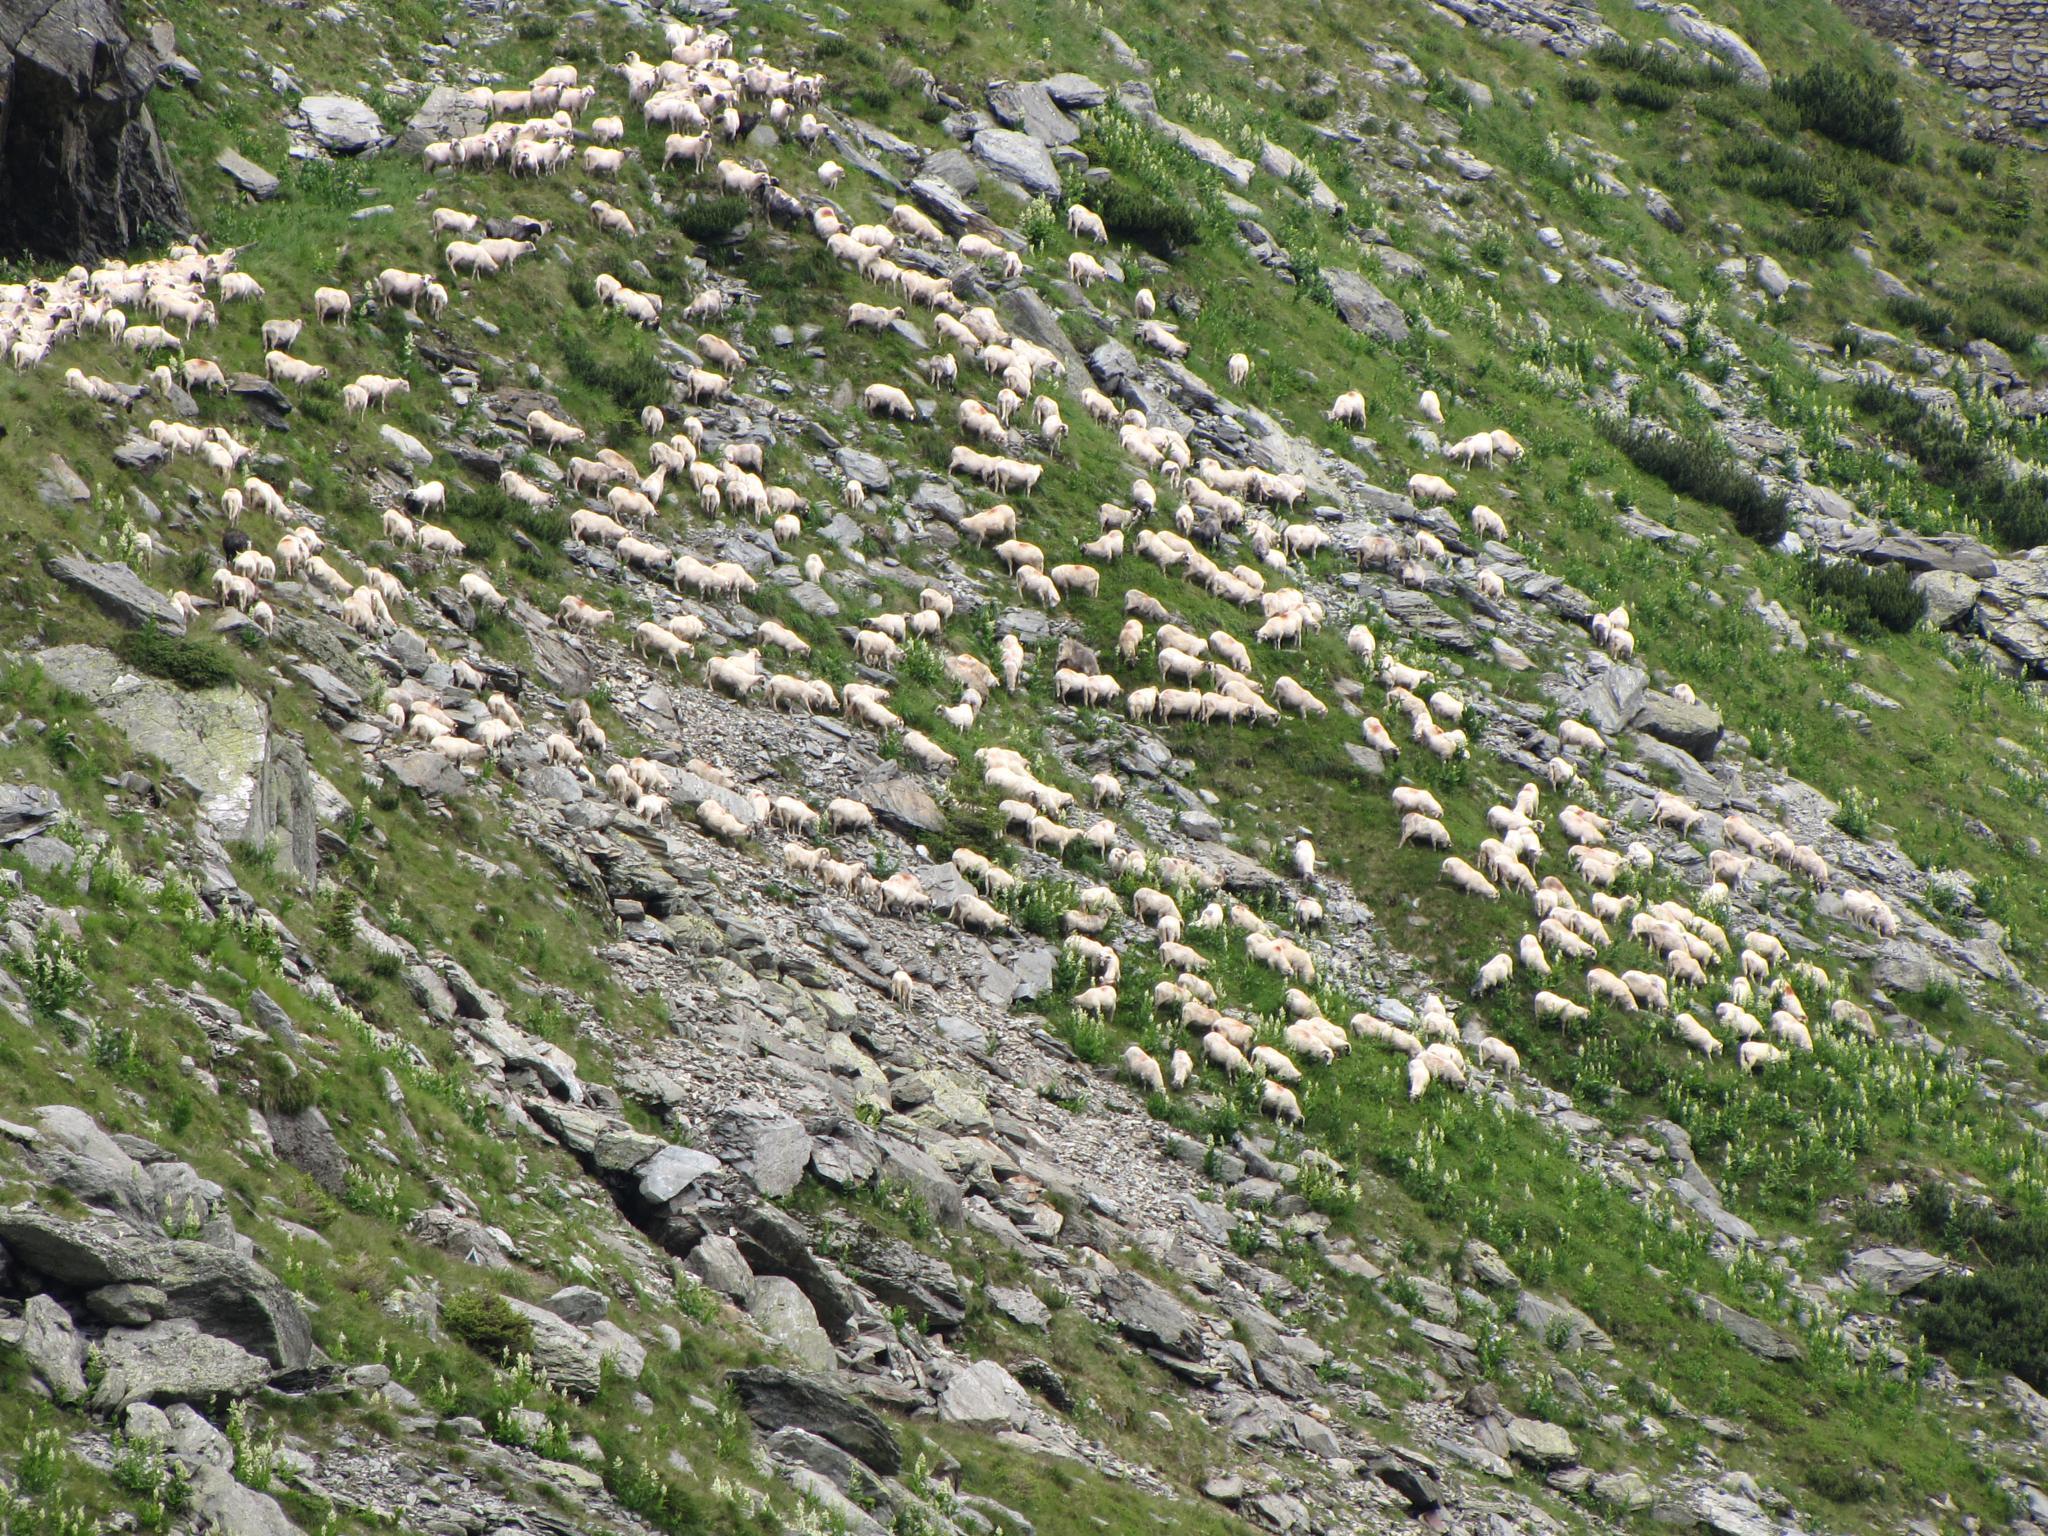 Sheep breeding in Fagaras Mountains RO by sorin.bumbu.54